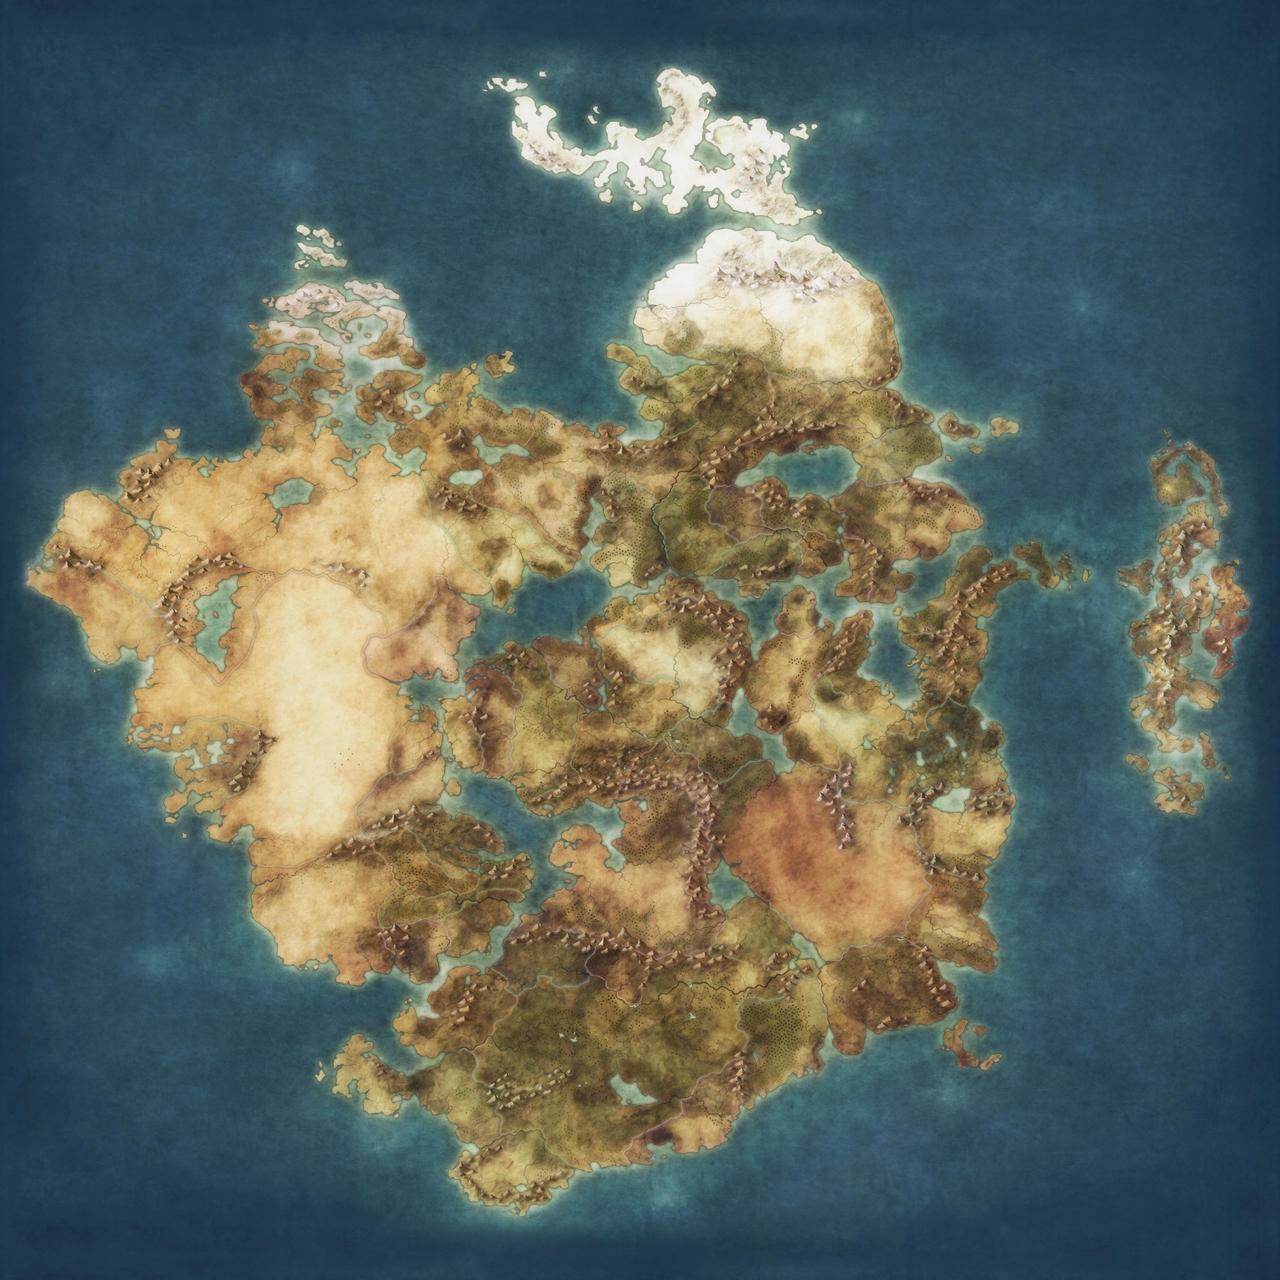 Blank Fantasy Map High Resolution By Quabbe On Deviantart